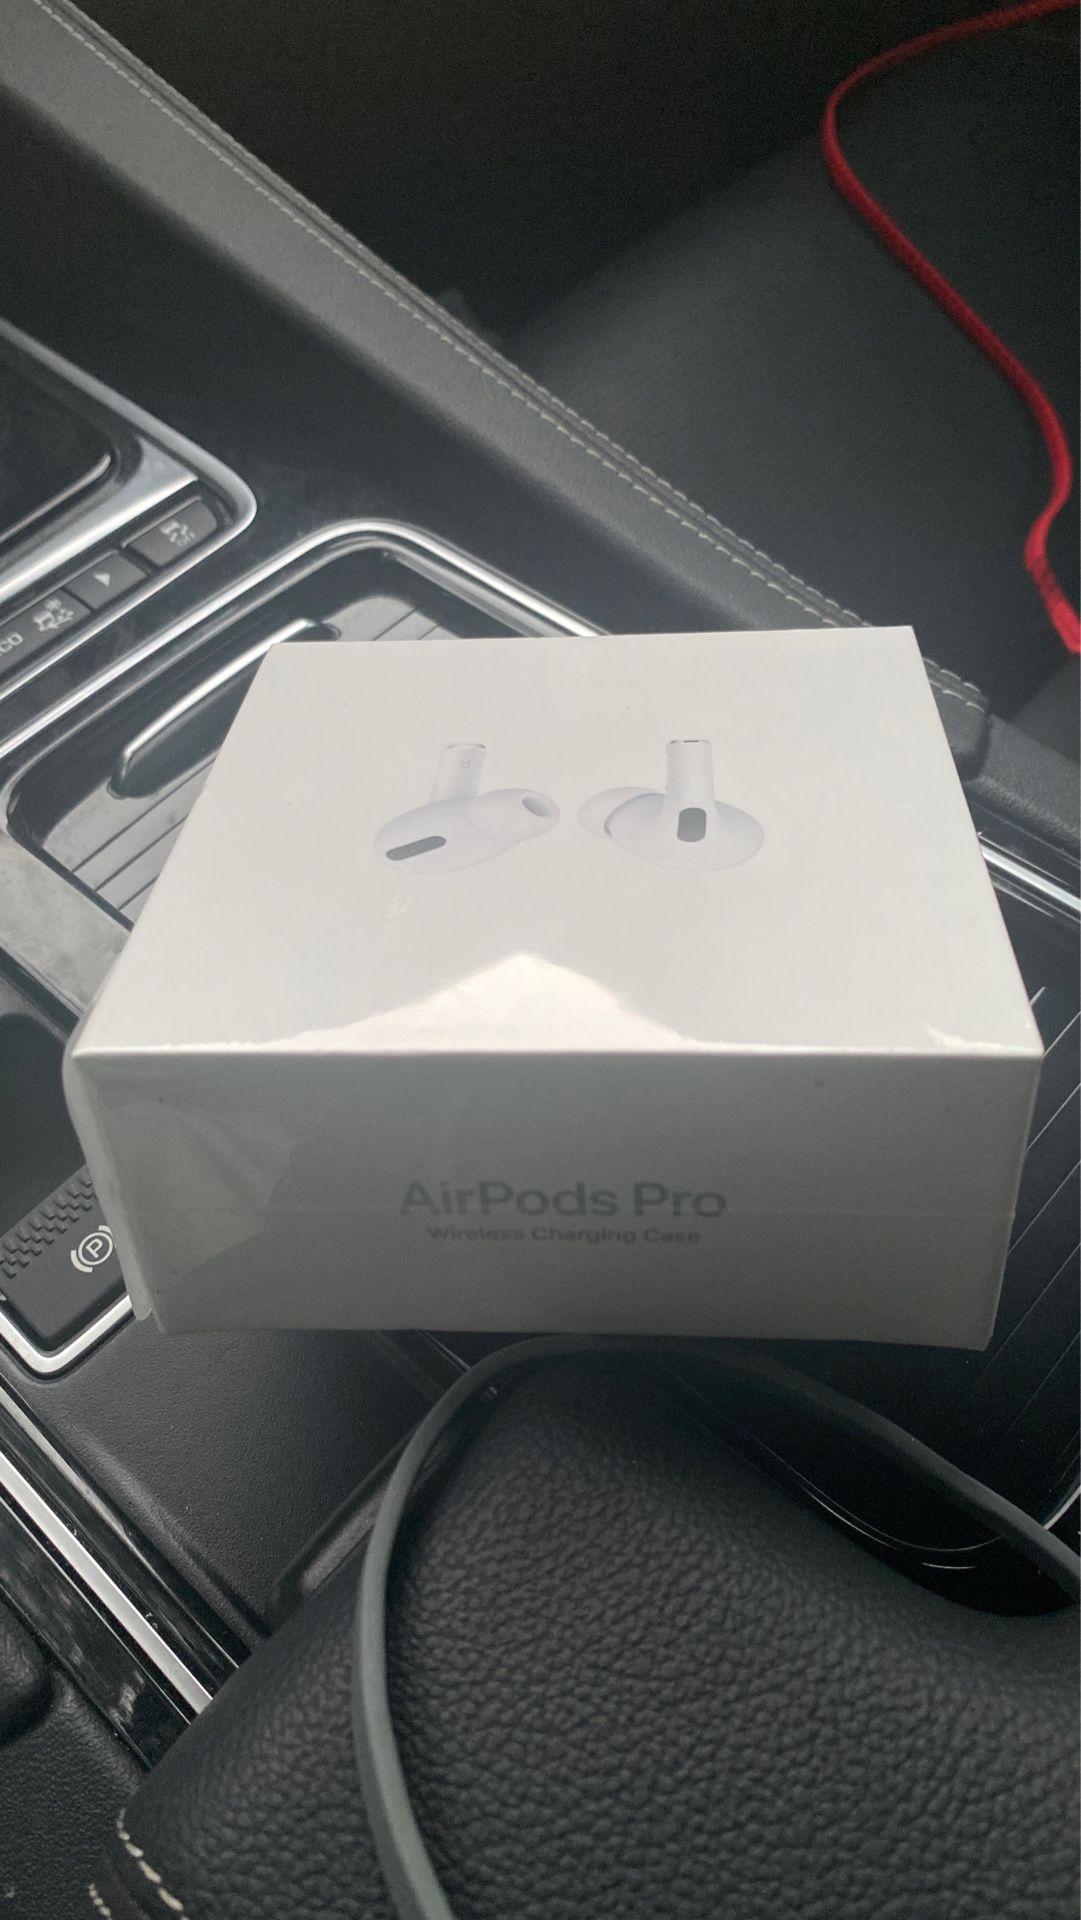 AirPod Pro